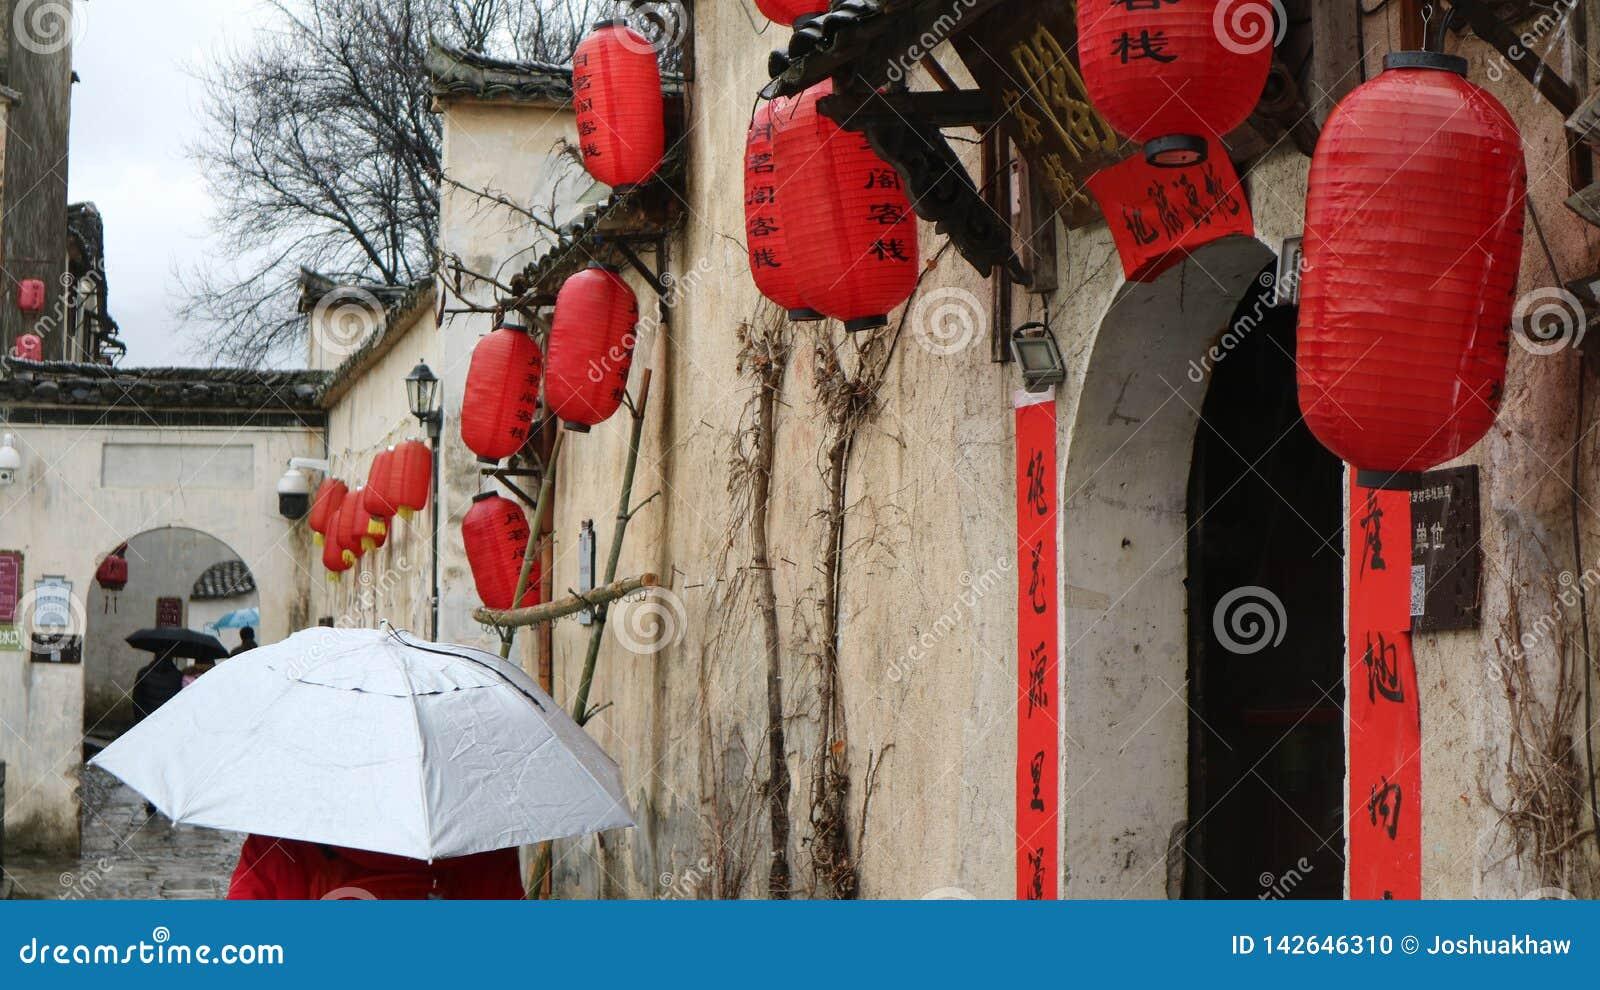 Walking through an ancient Chinese town